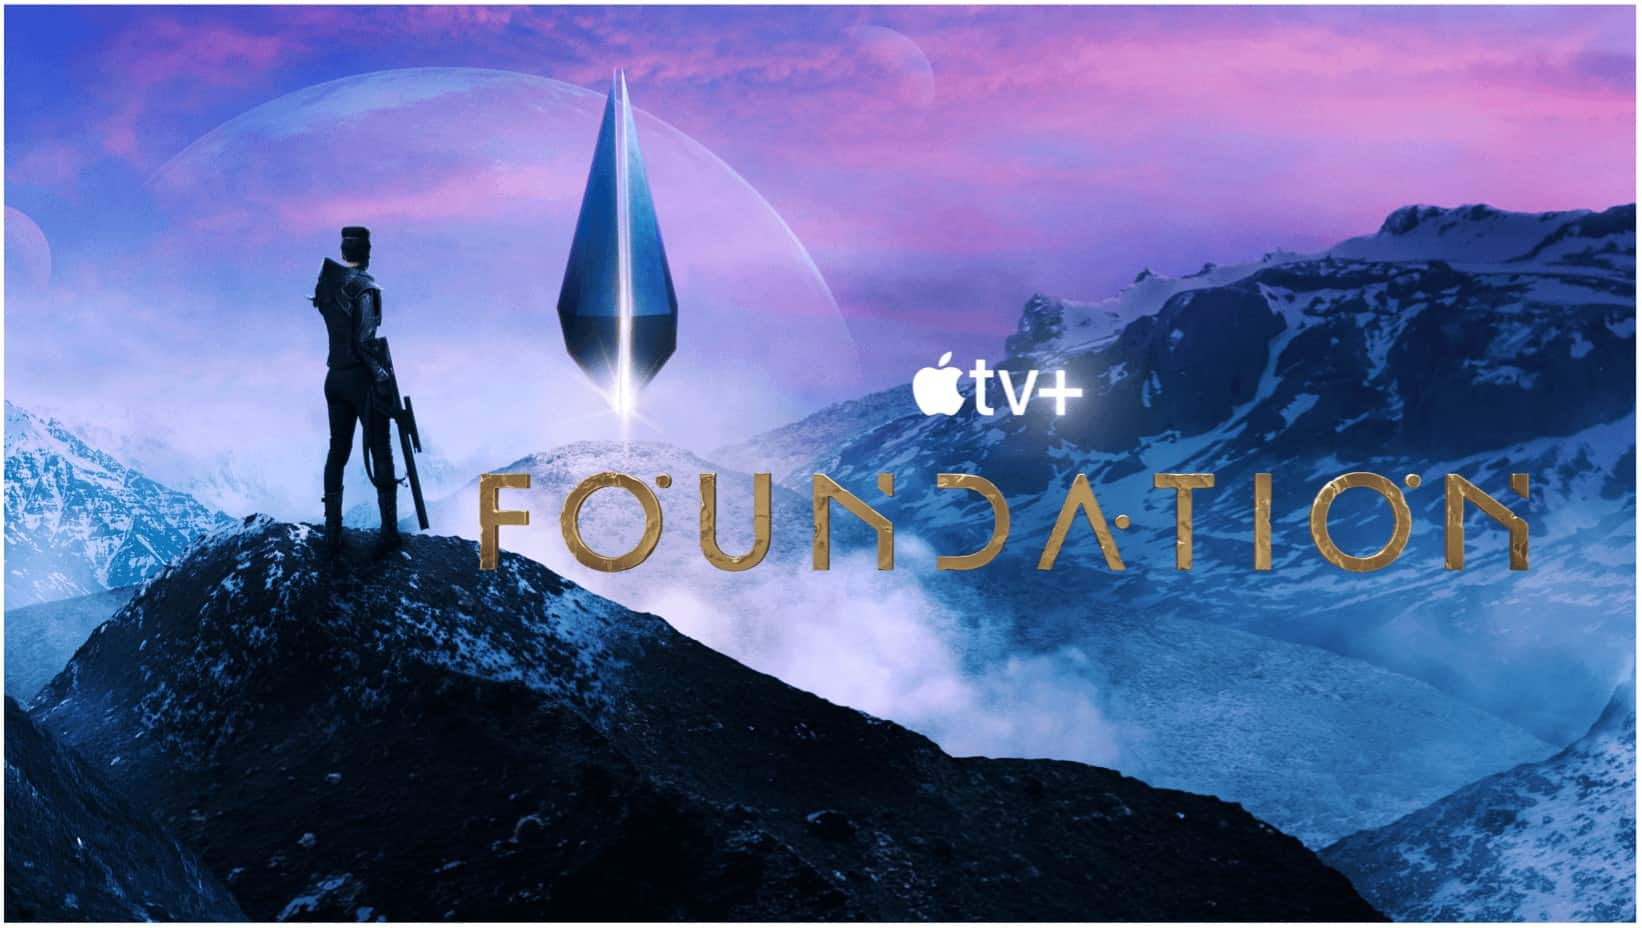 Apple TV+'s Foundation